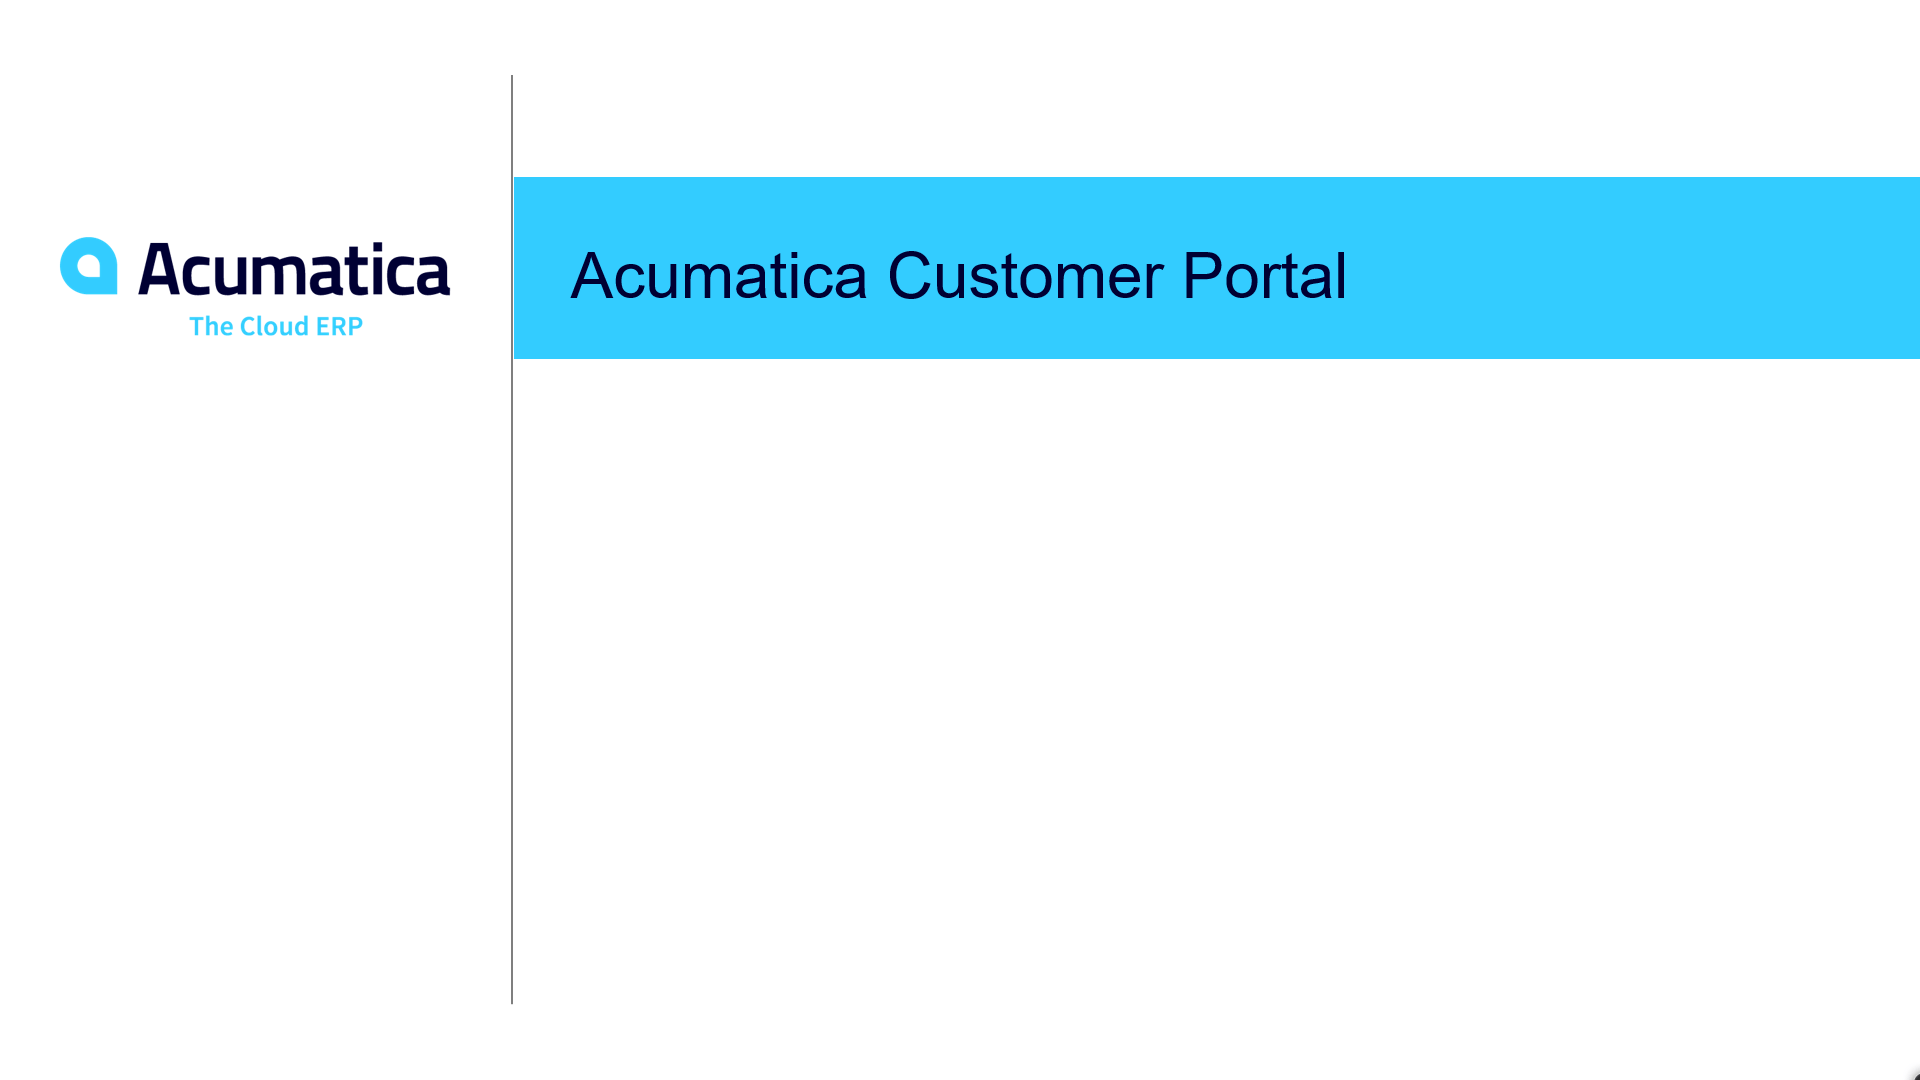 Acumatica Customer Portal